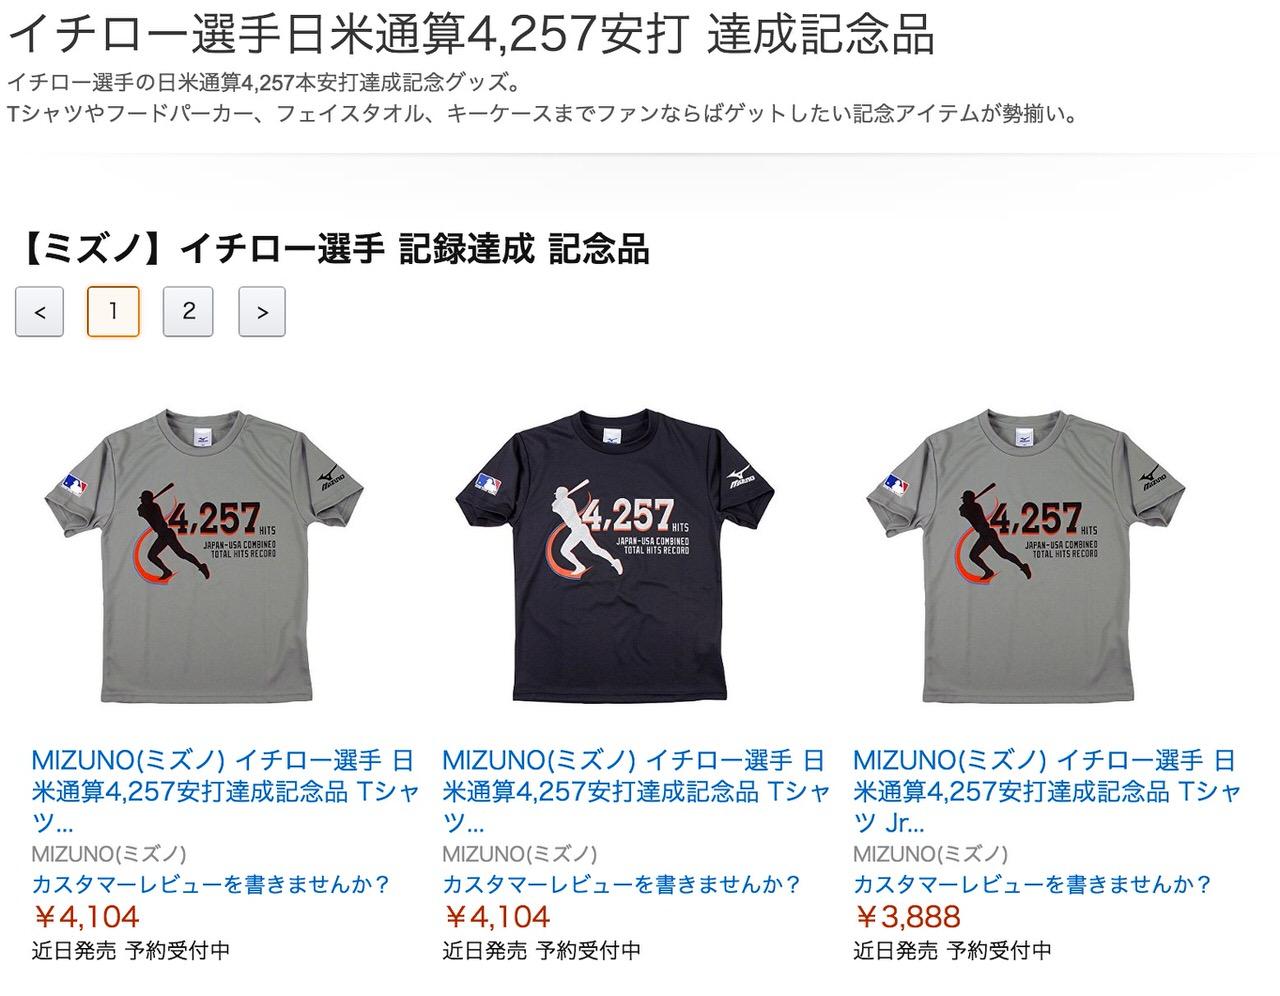 Amazon「イチロー選手日米通算4,257安打 達成記念グッズ」取扱開始 → Tシャツやパーカーの予約受付中